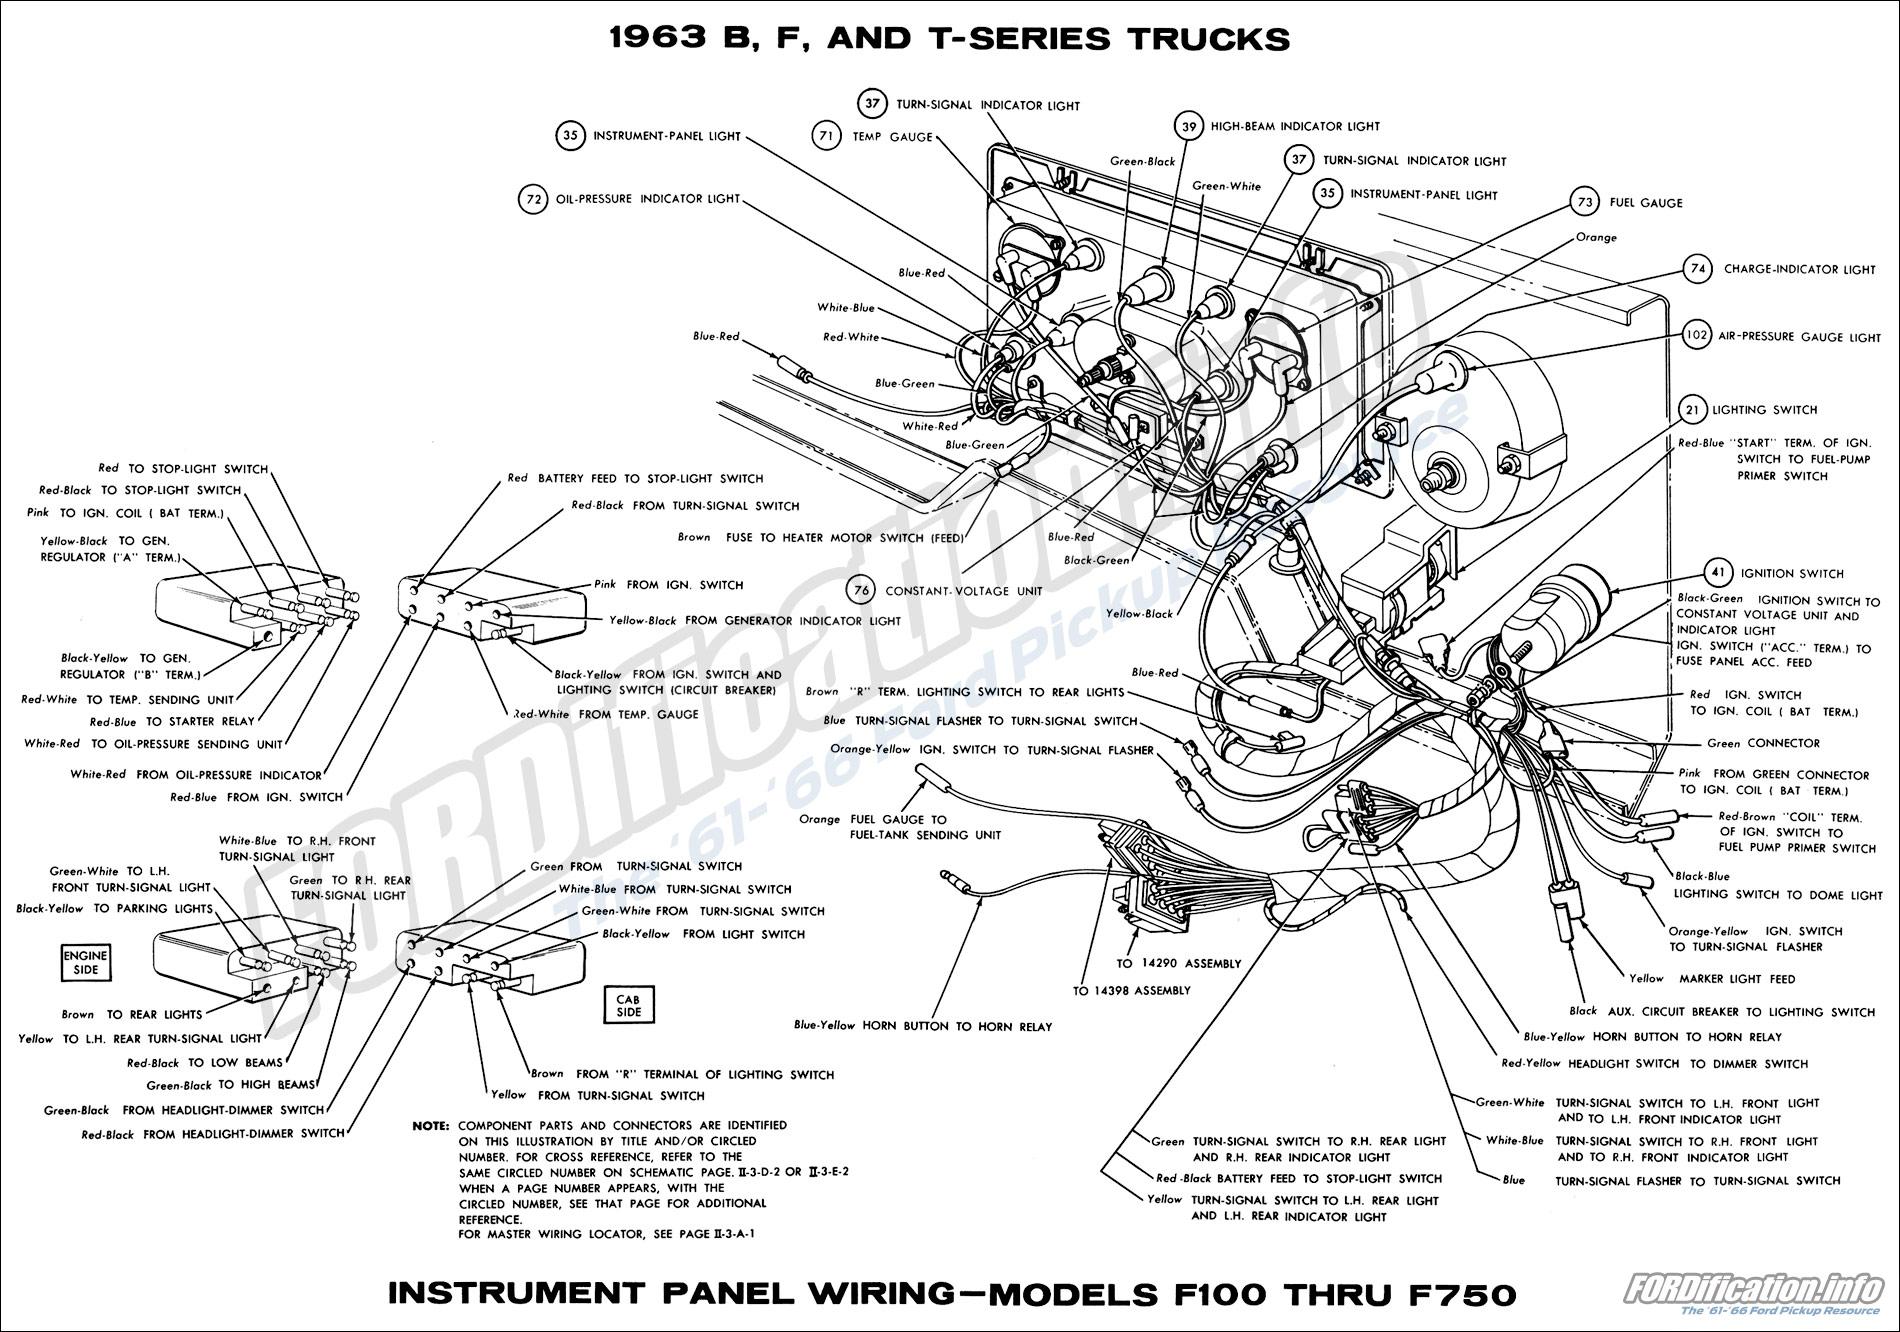 hight resolution of 1963 b f and t series trucks instrument panel wiring models f100 thru f750